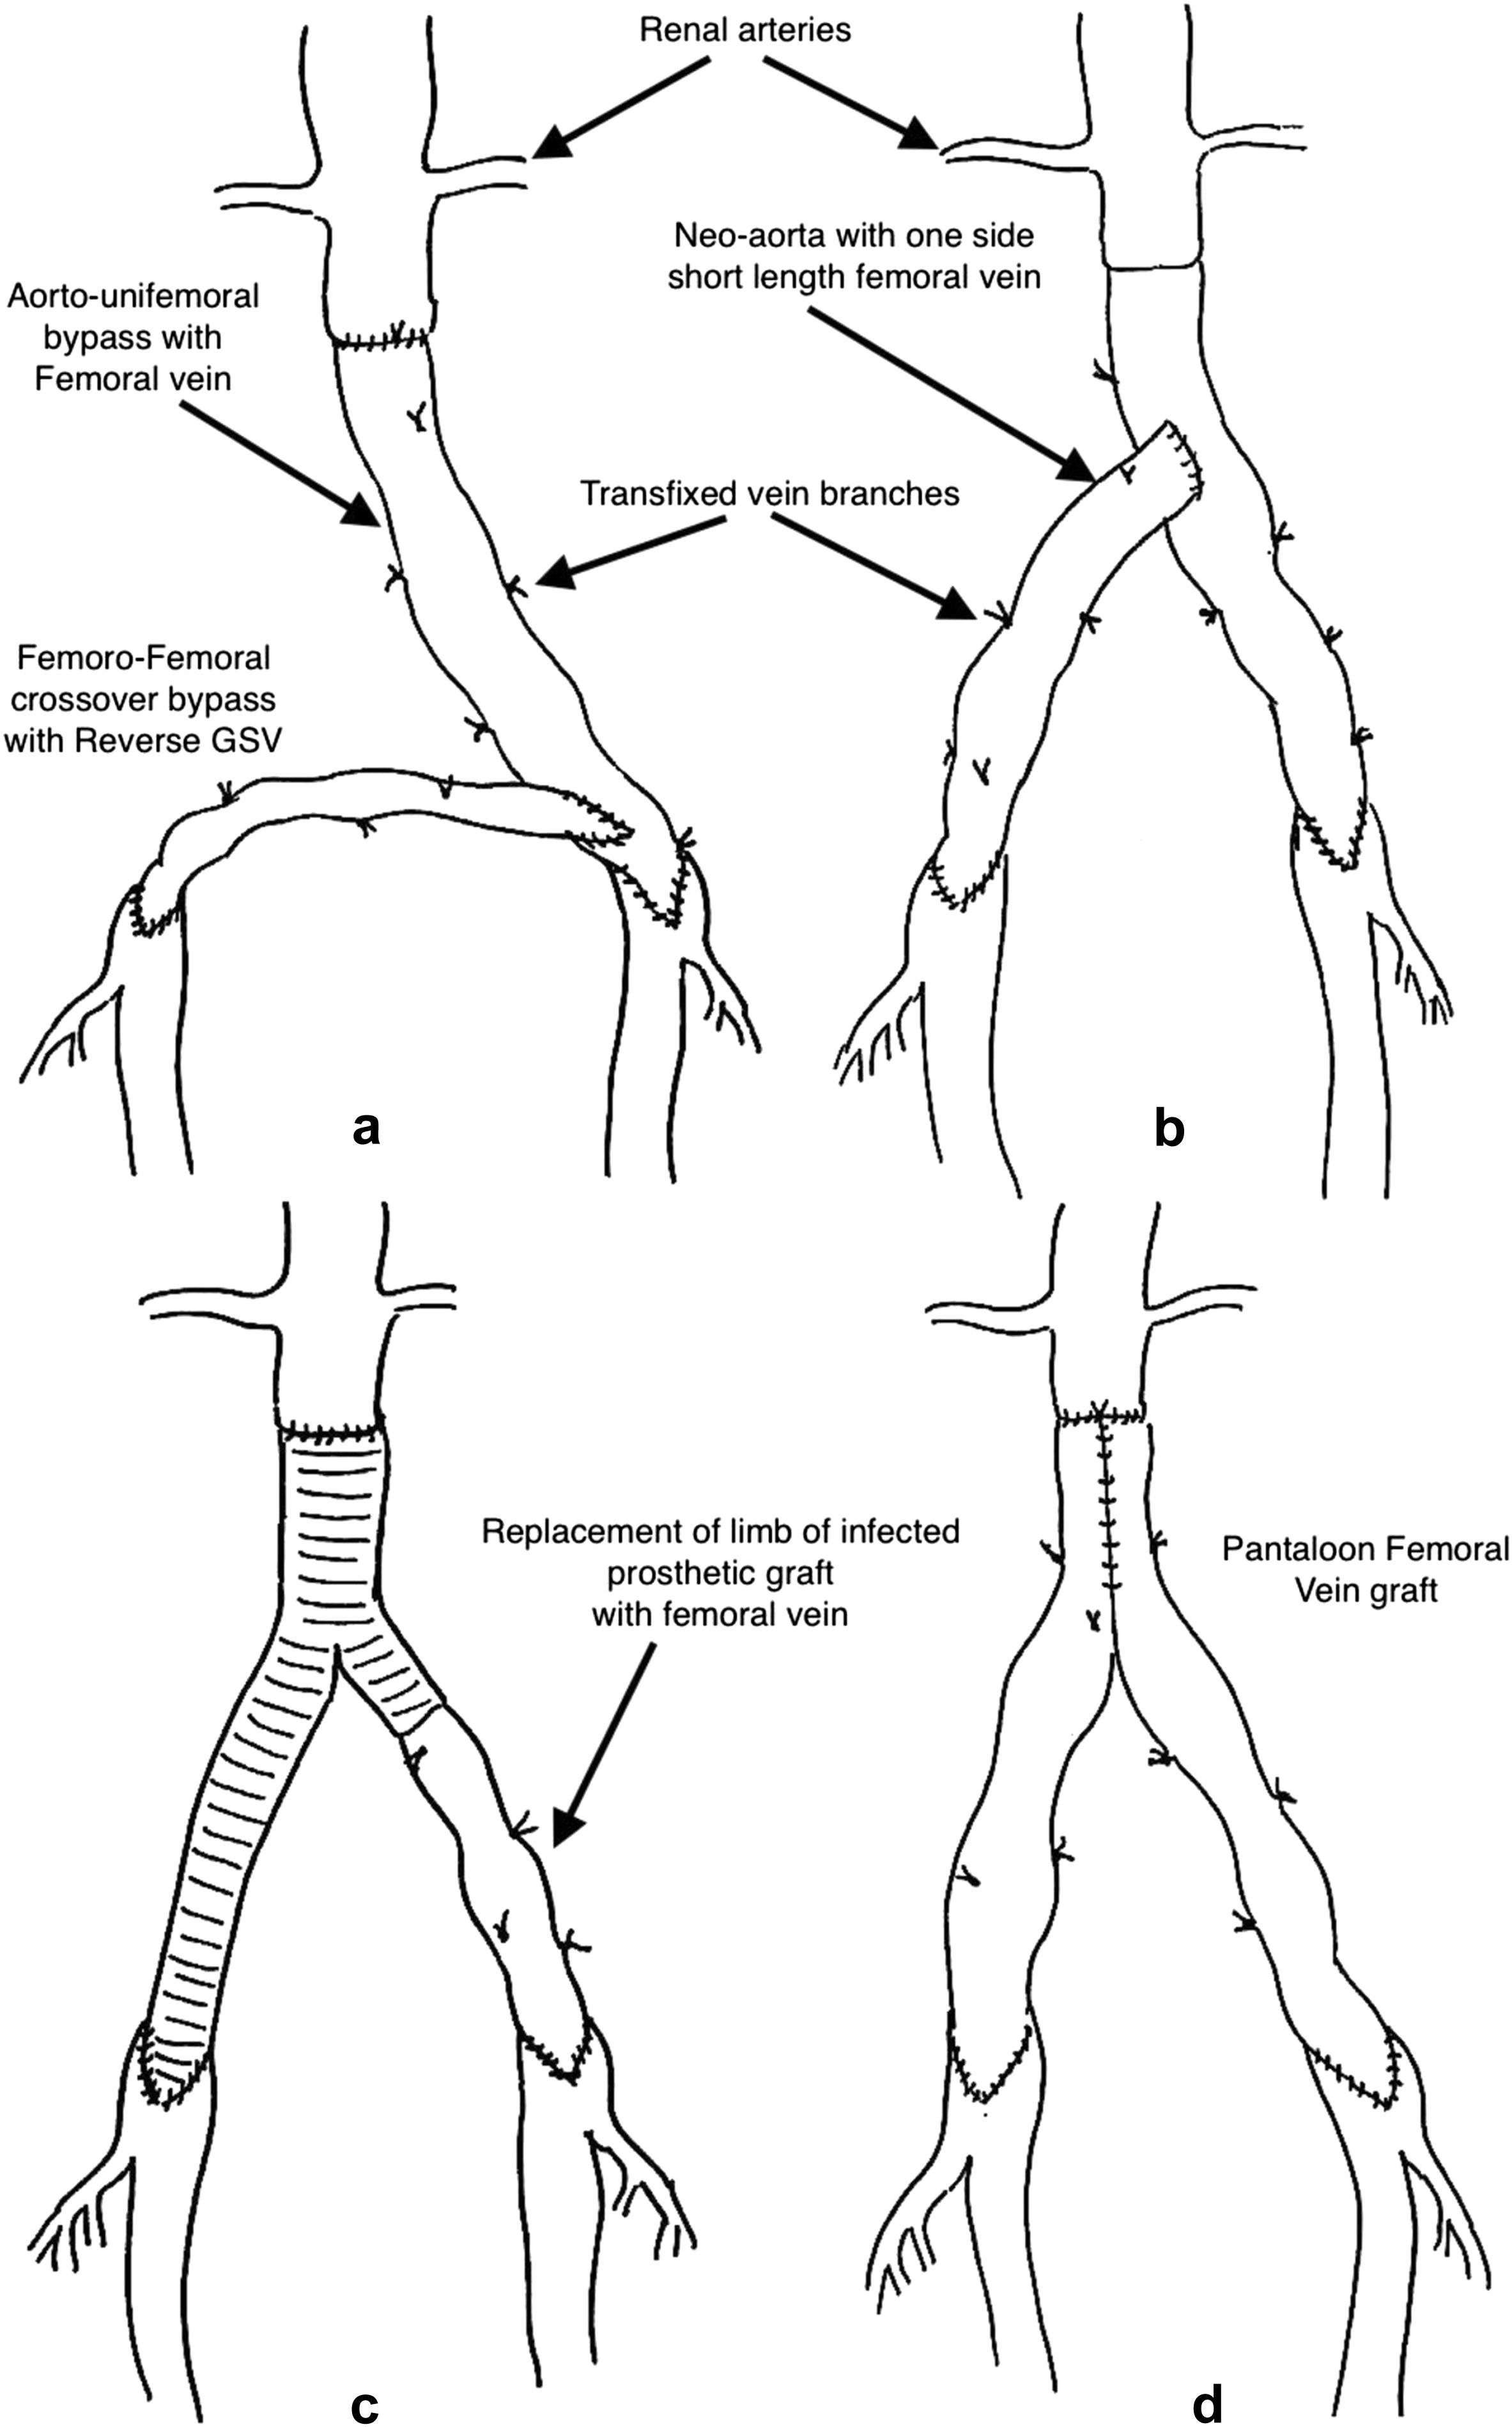 Pantaloon Femoral Vein Graft As Neoaorta In Infected